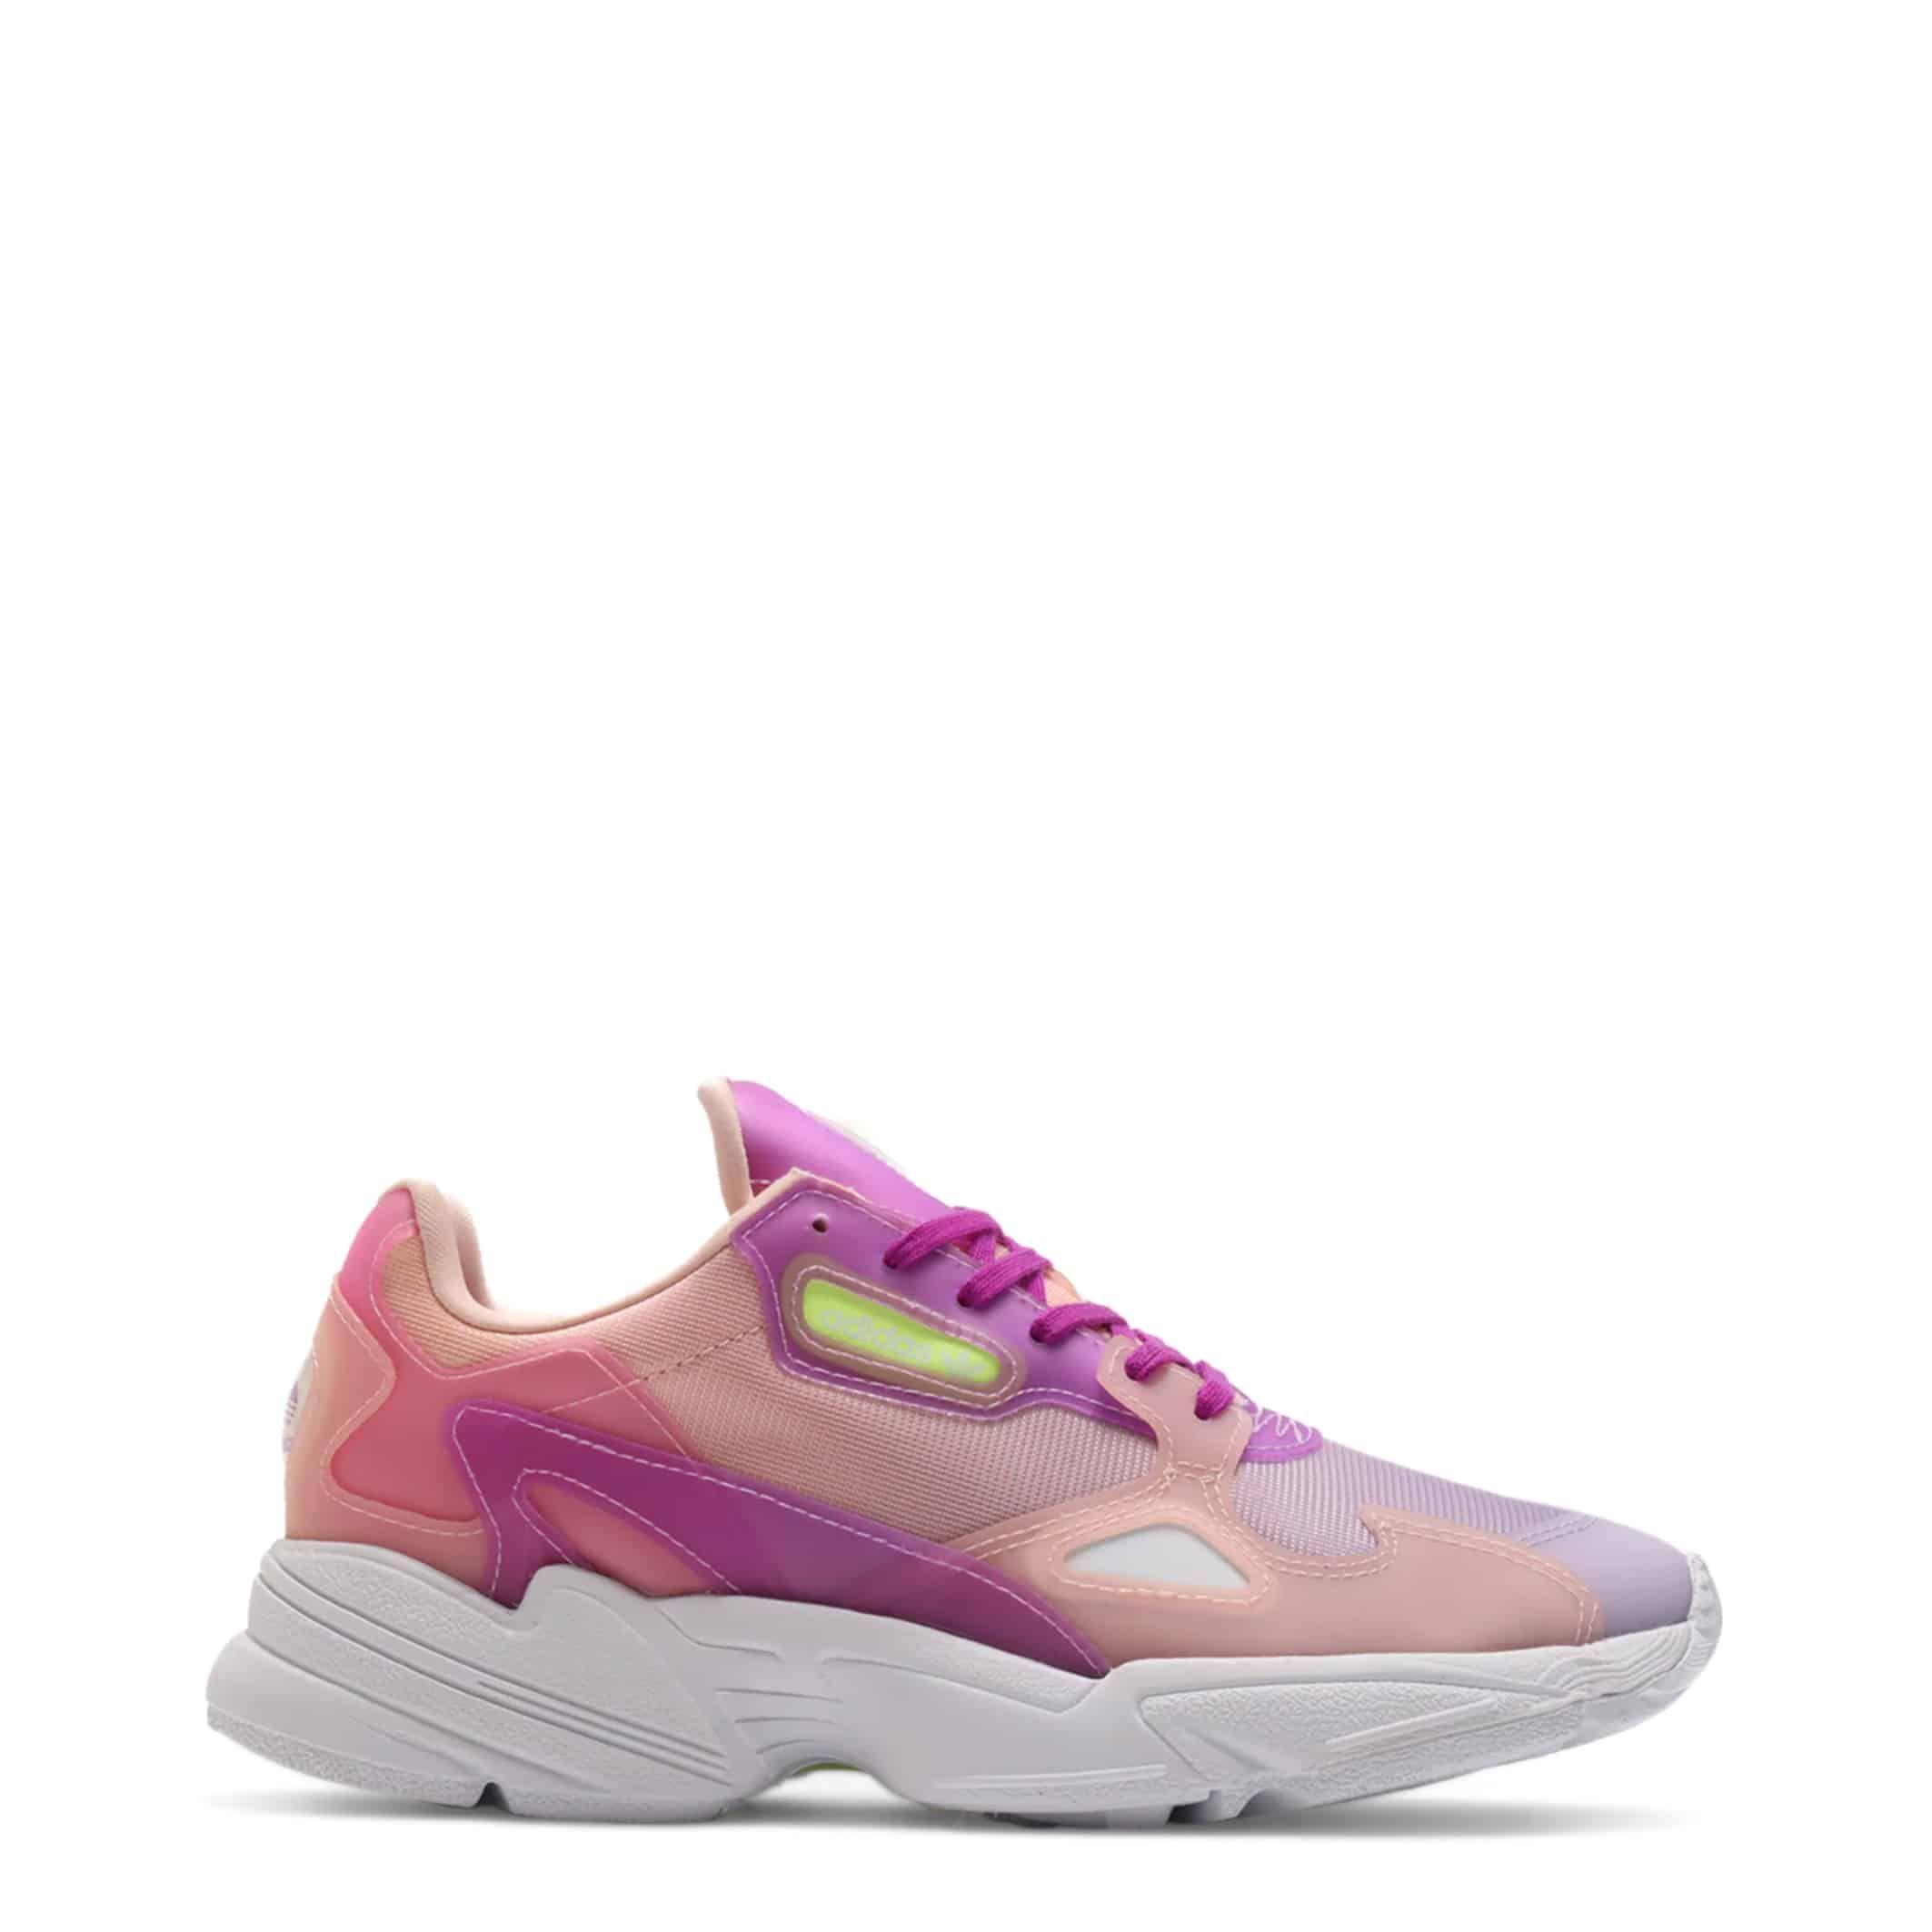 Adidas – FALCON – Rosa